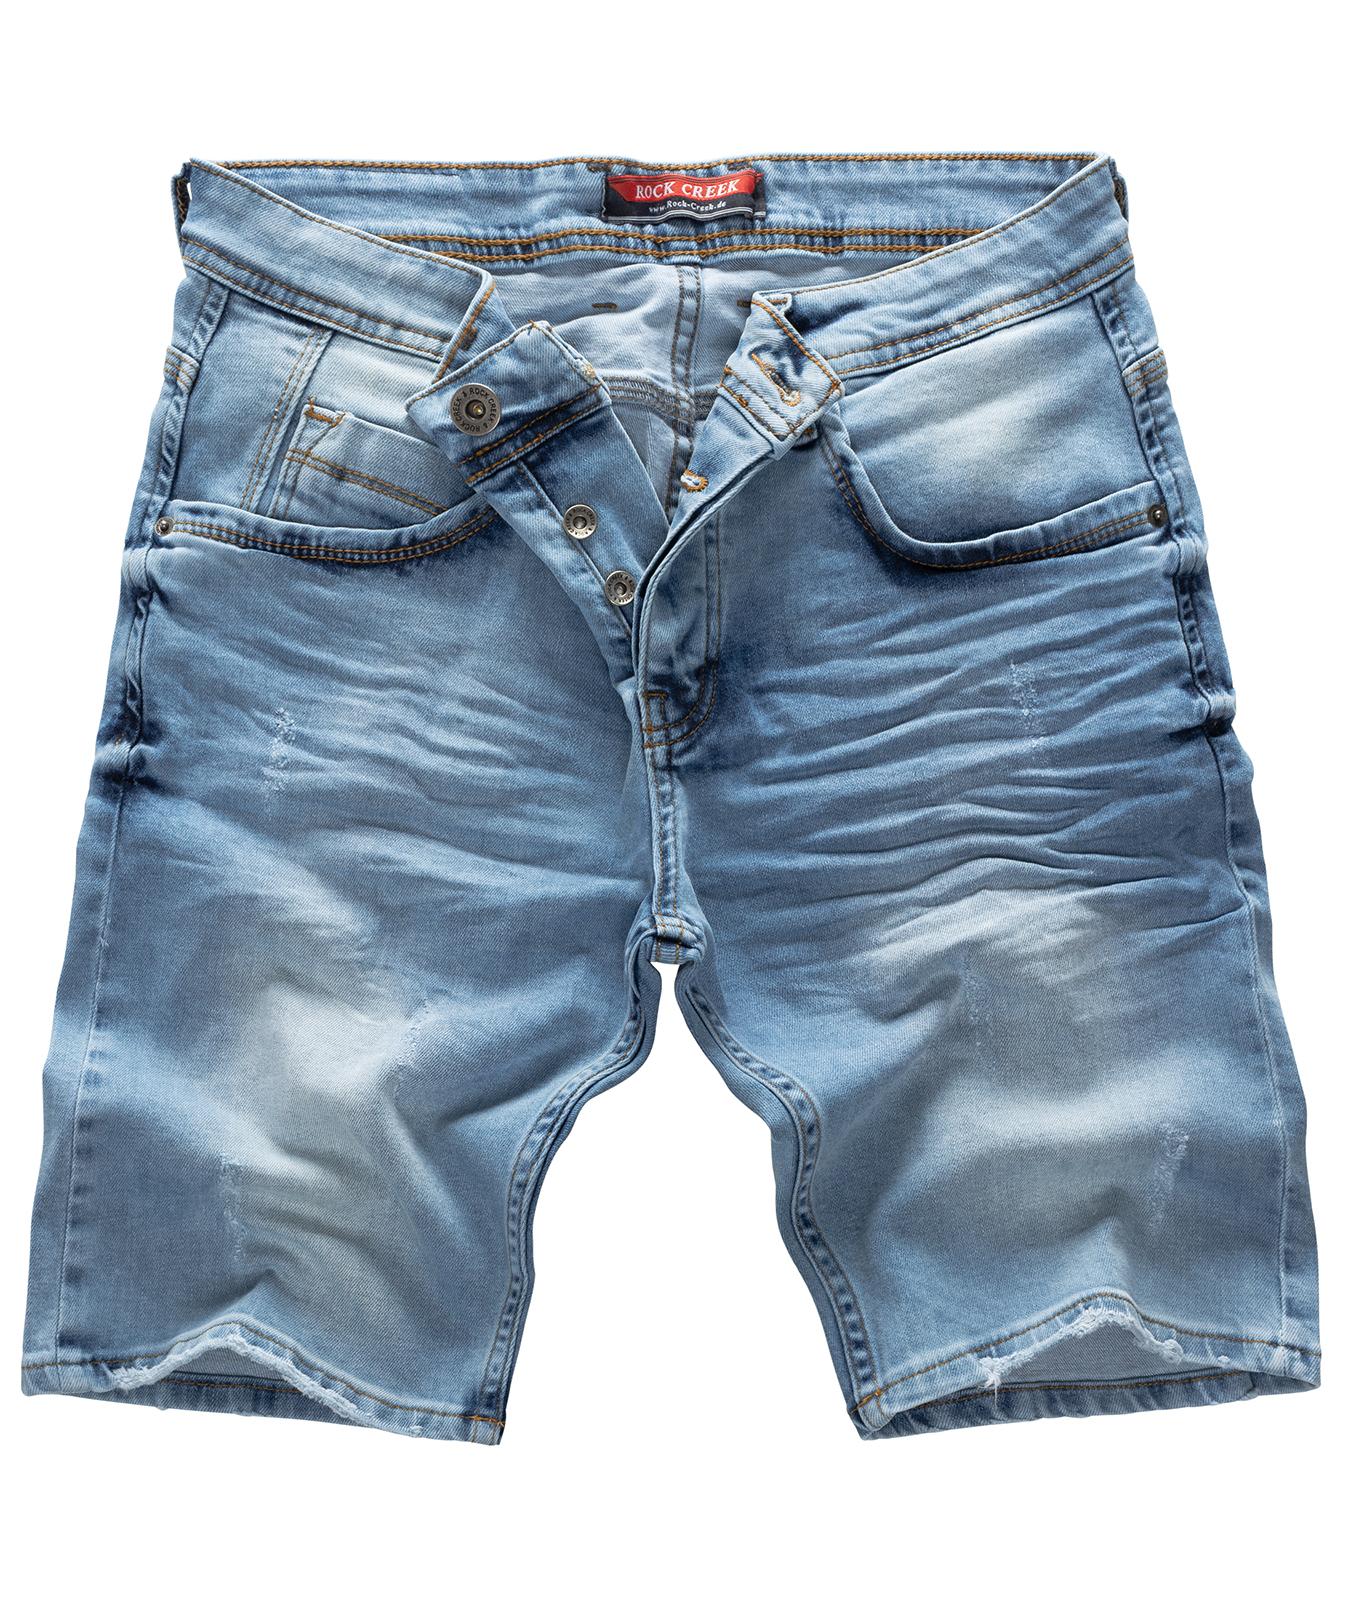 Detalles de Rock Creek Pantalones Cortos Hombre Vaqueros Denim Stretch Verano W29 W40 M23